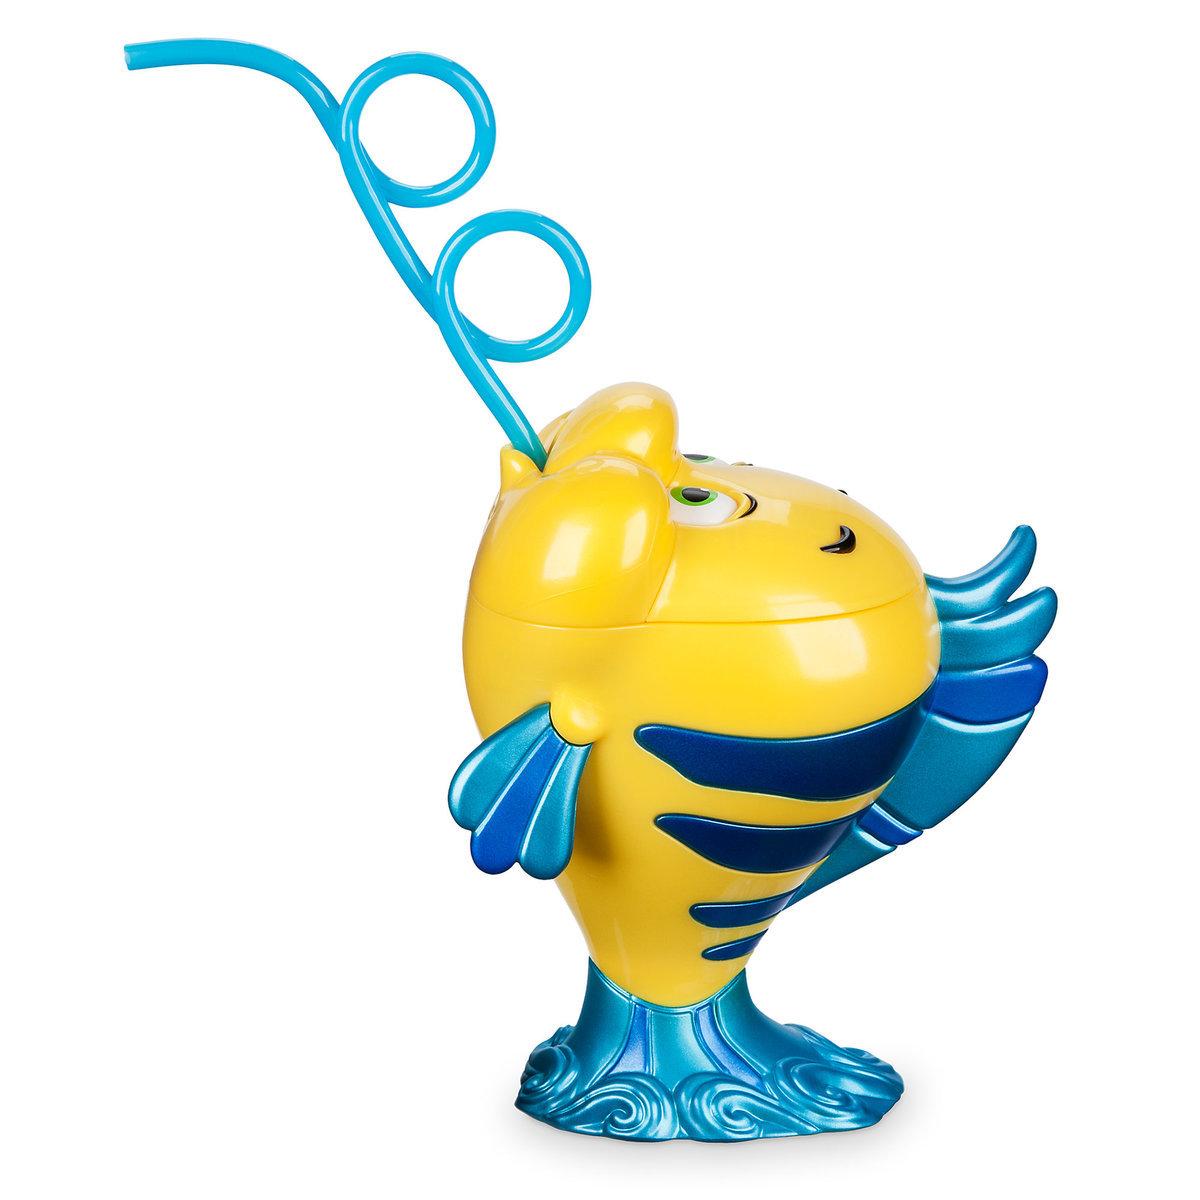 Flounder Novelty Cup - Oh My Disney ของแท้ นำเข้าจากอเมริกา